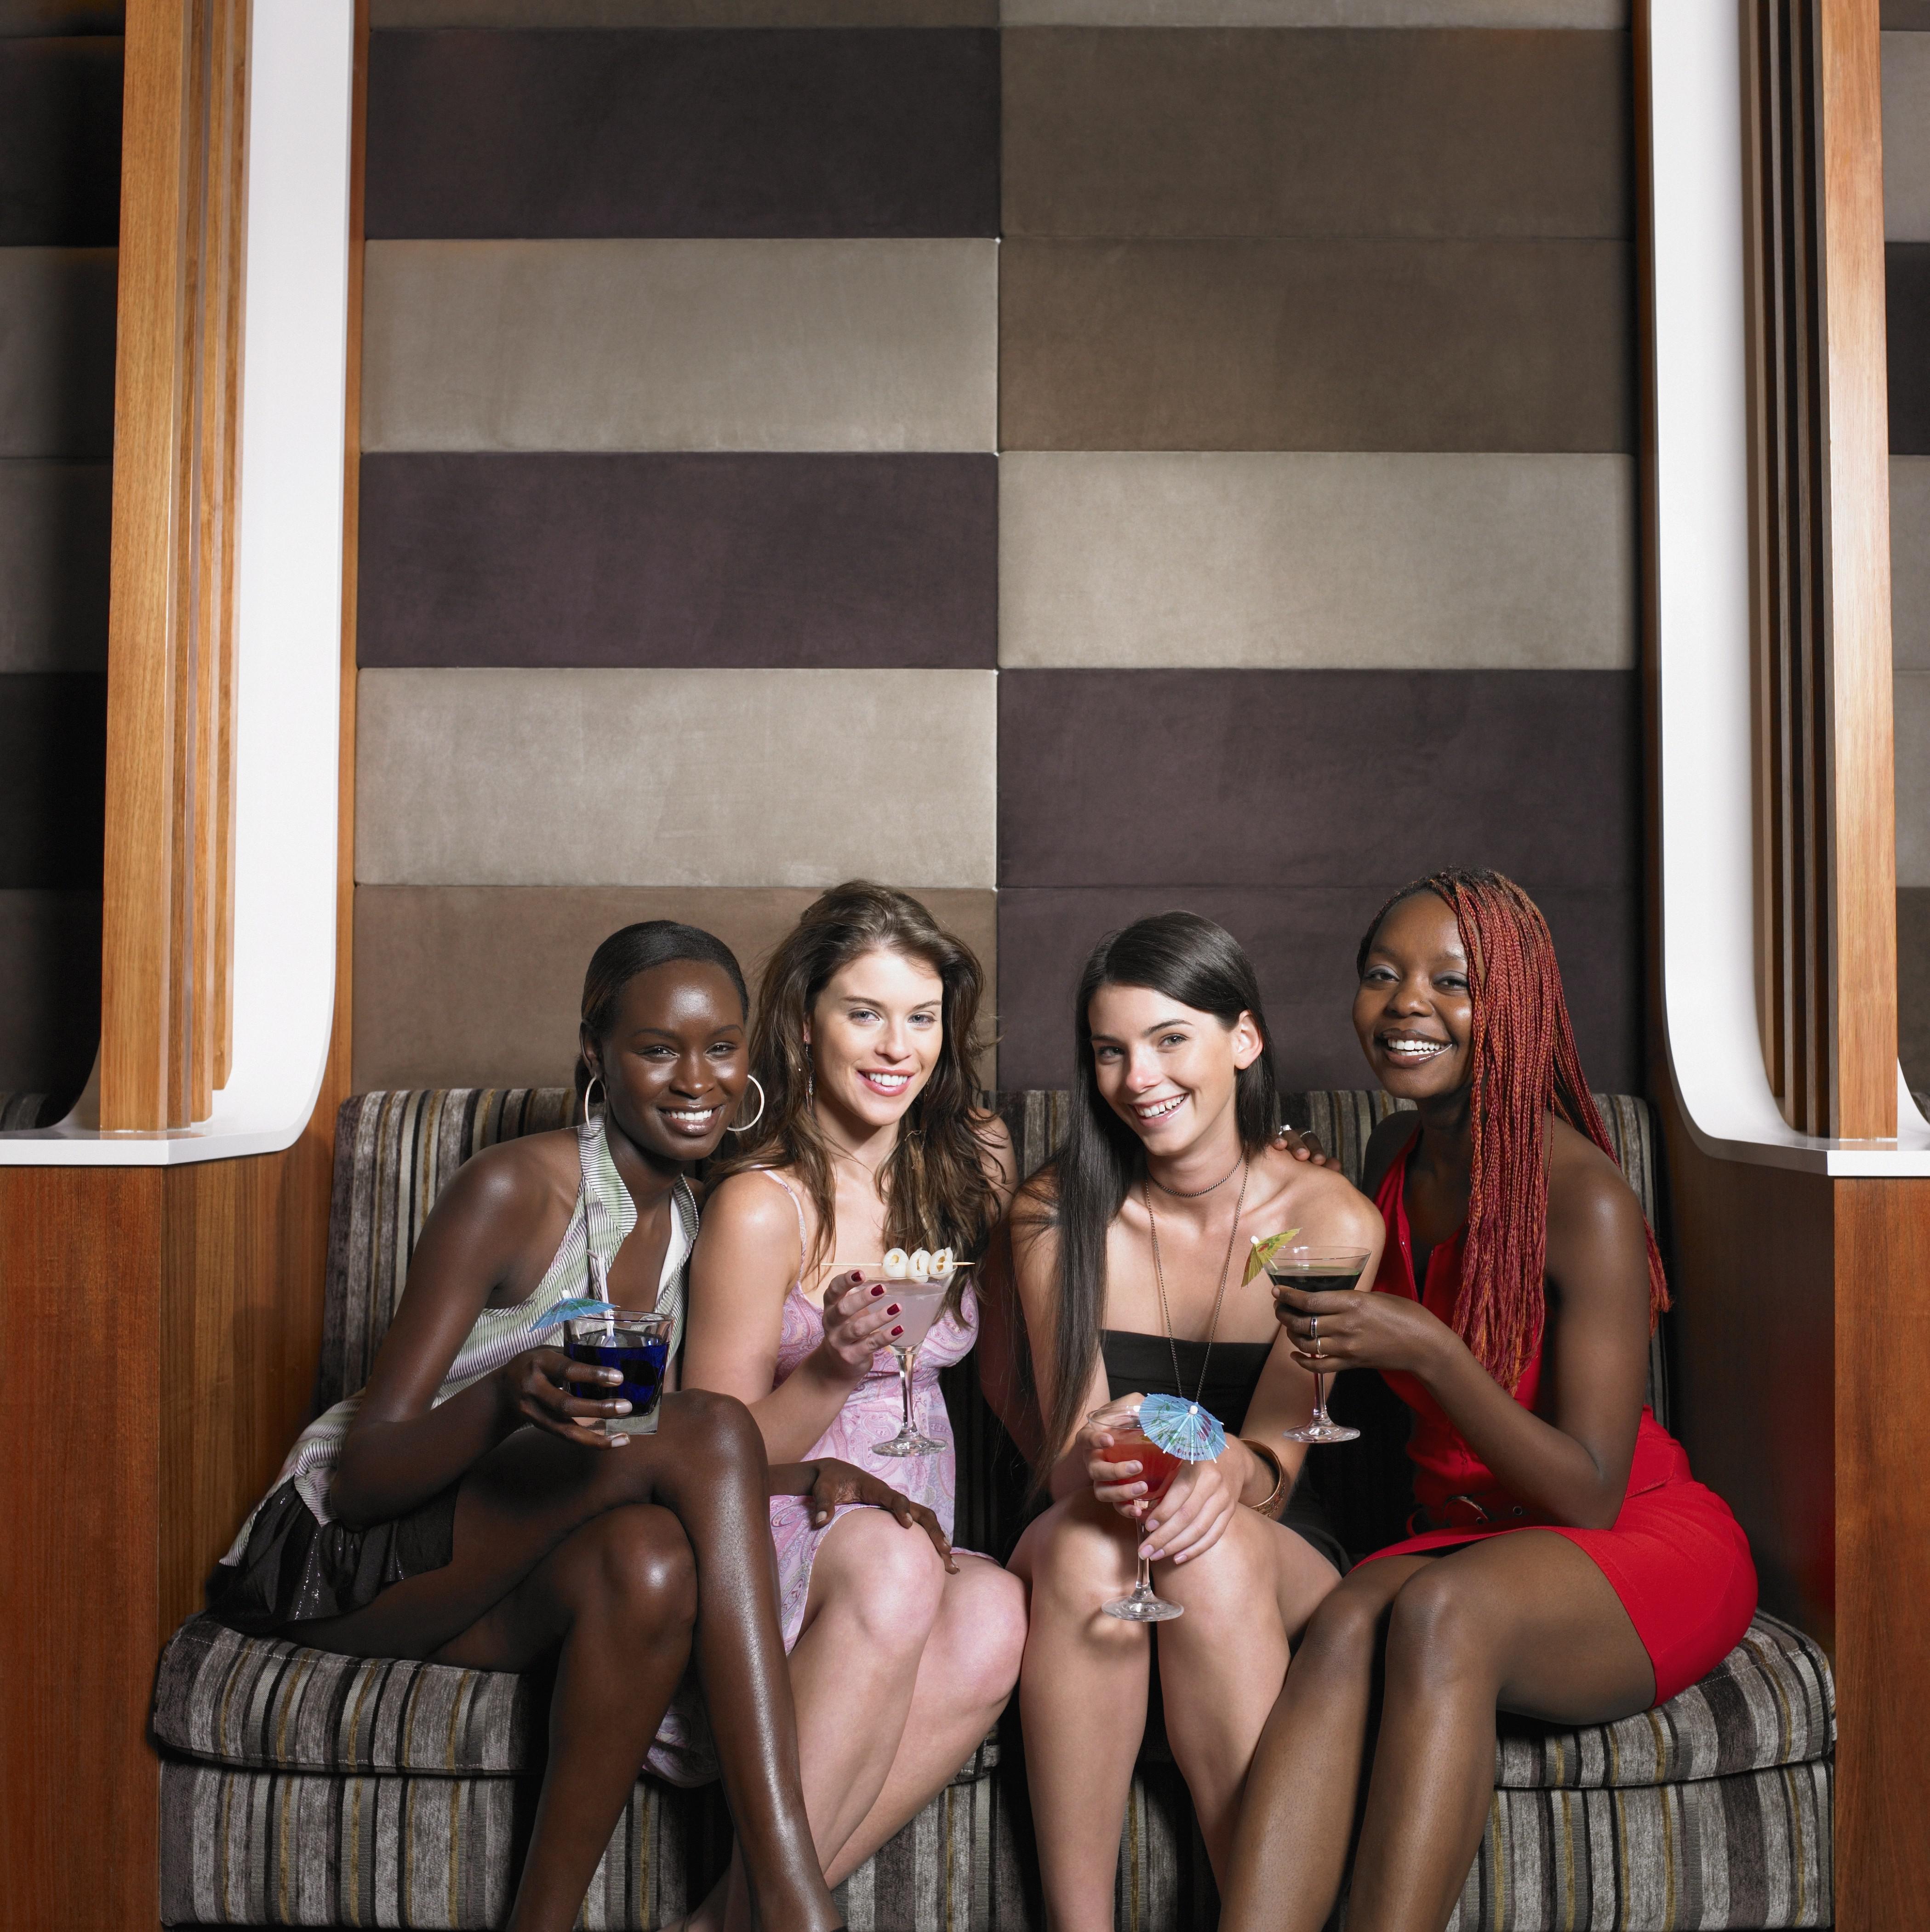 Group of female friends having drinks